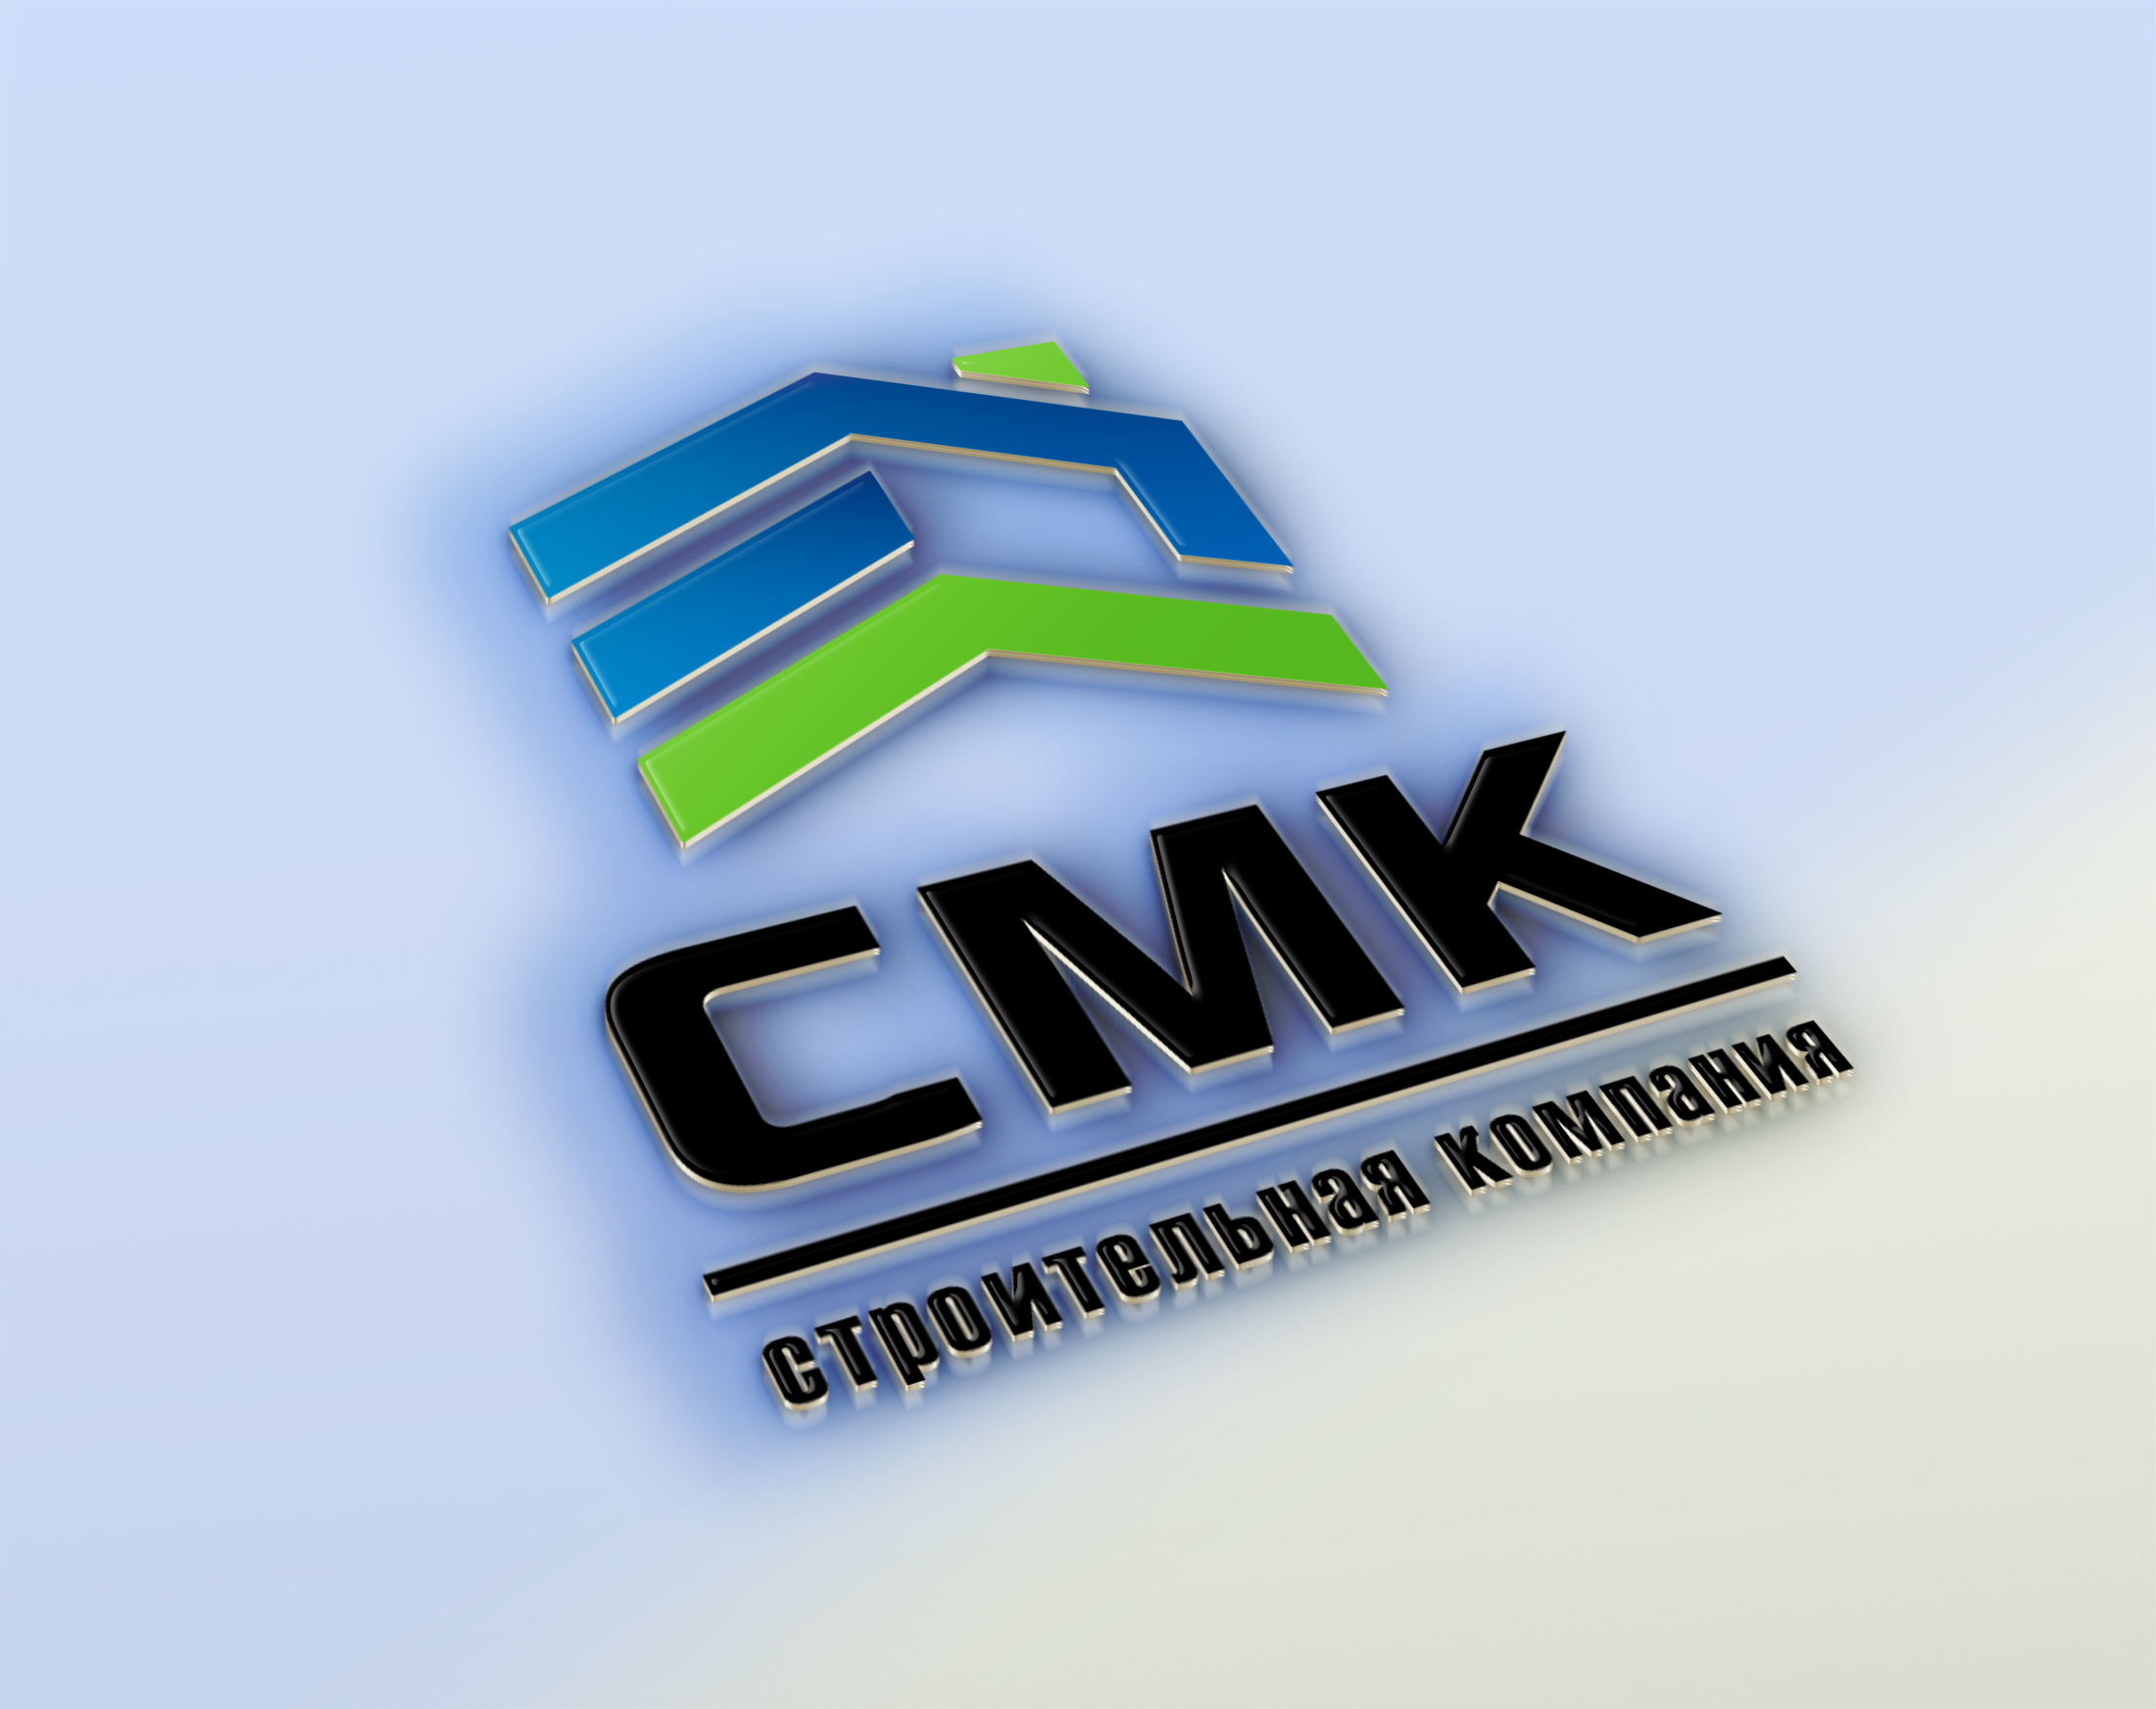 Разработка логотипа компании фото f_3905de285bf83bda.jpg